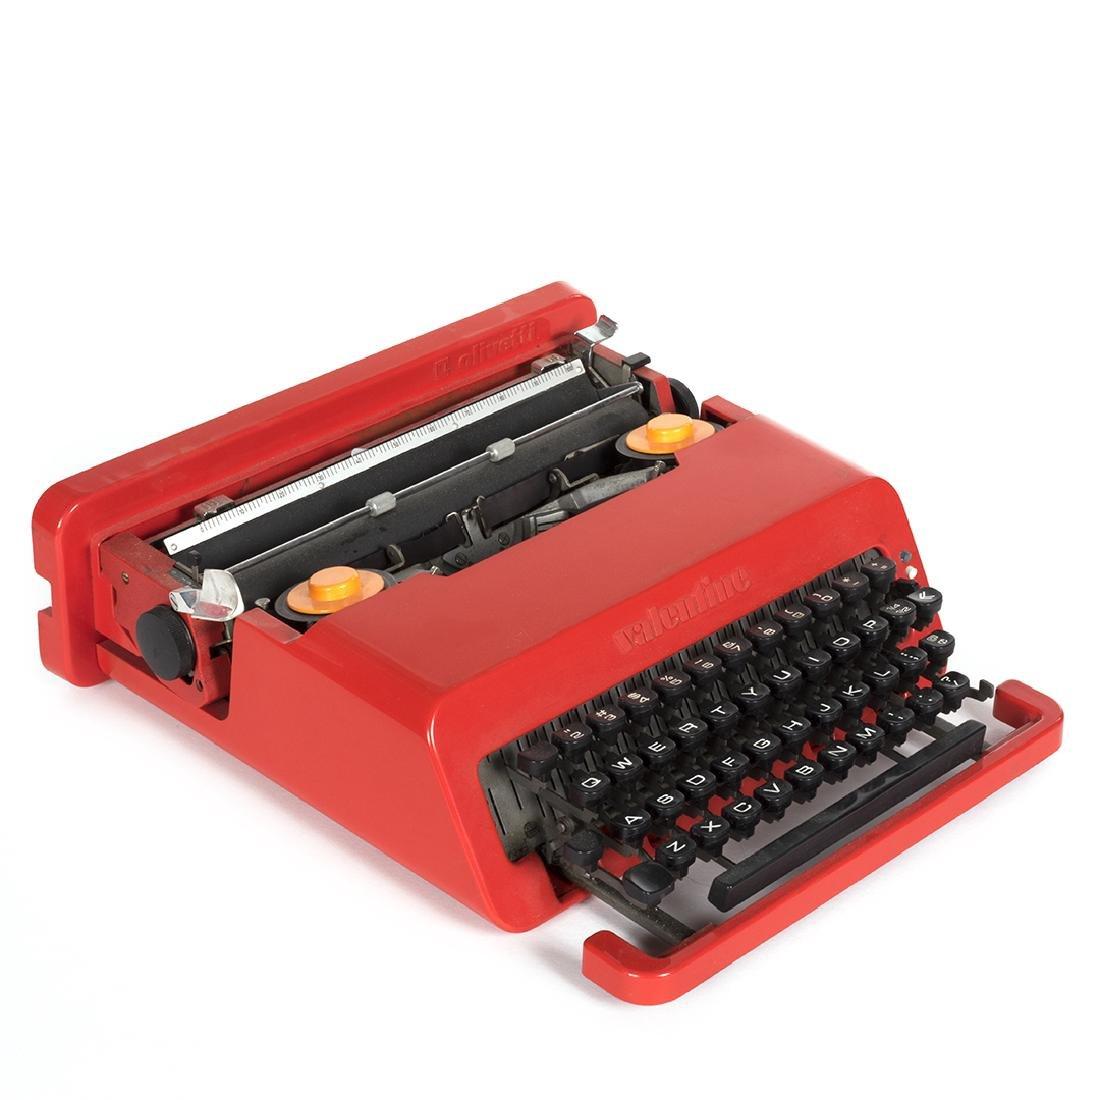 Ettore Sottsass Valentine Typewriter